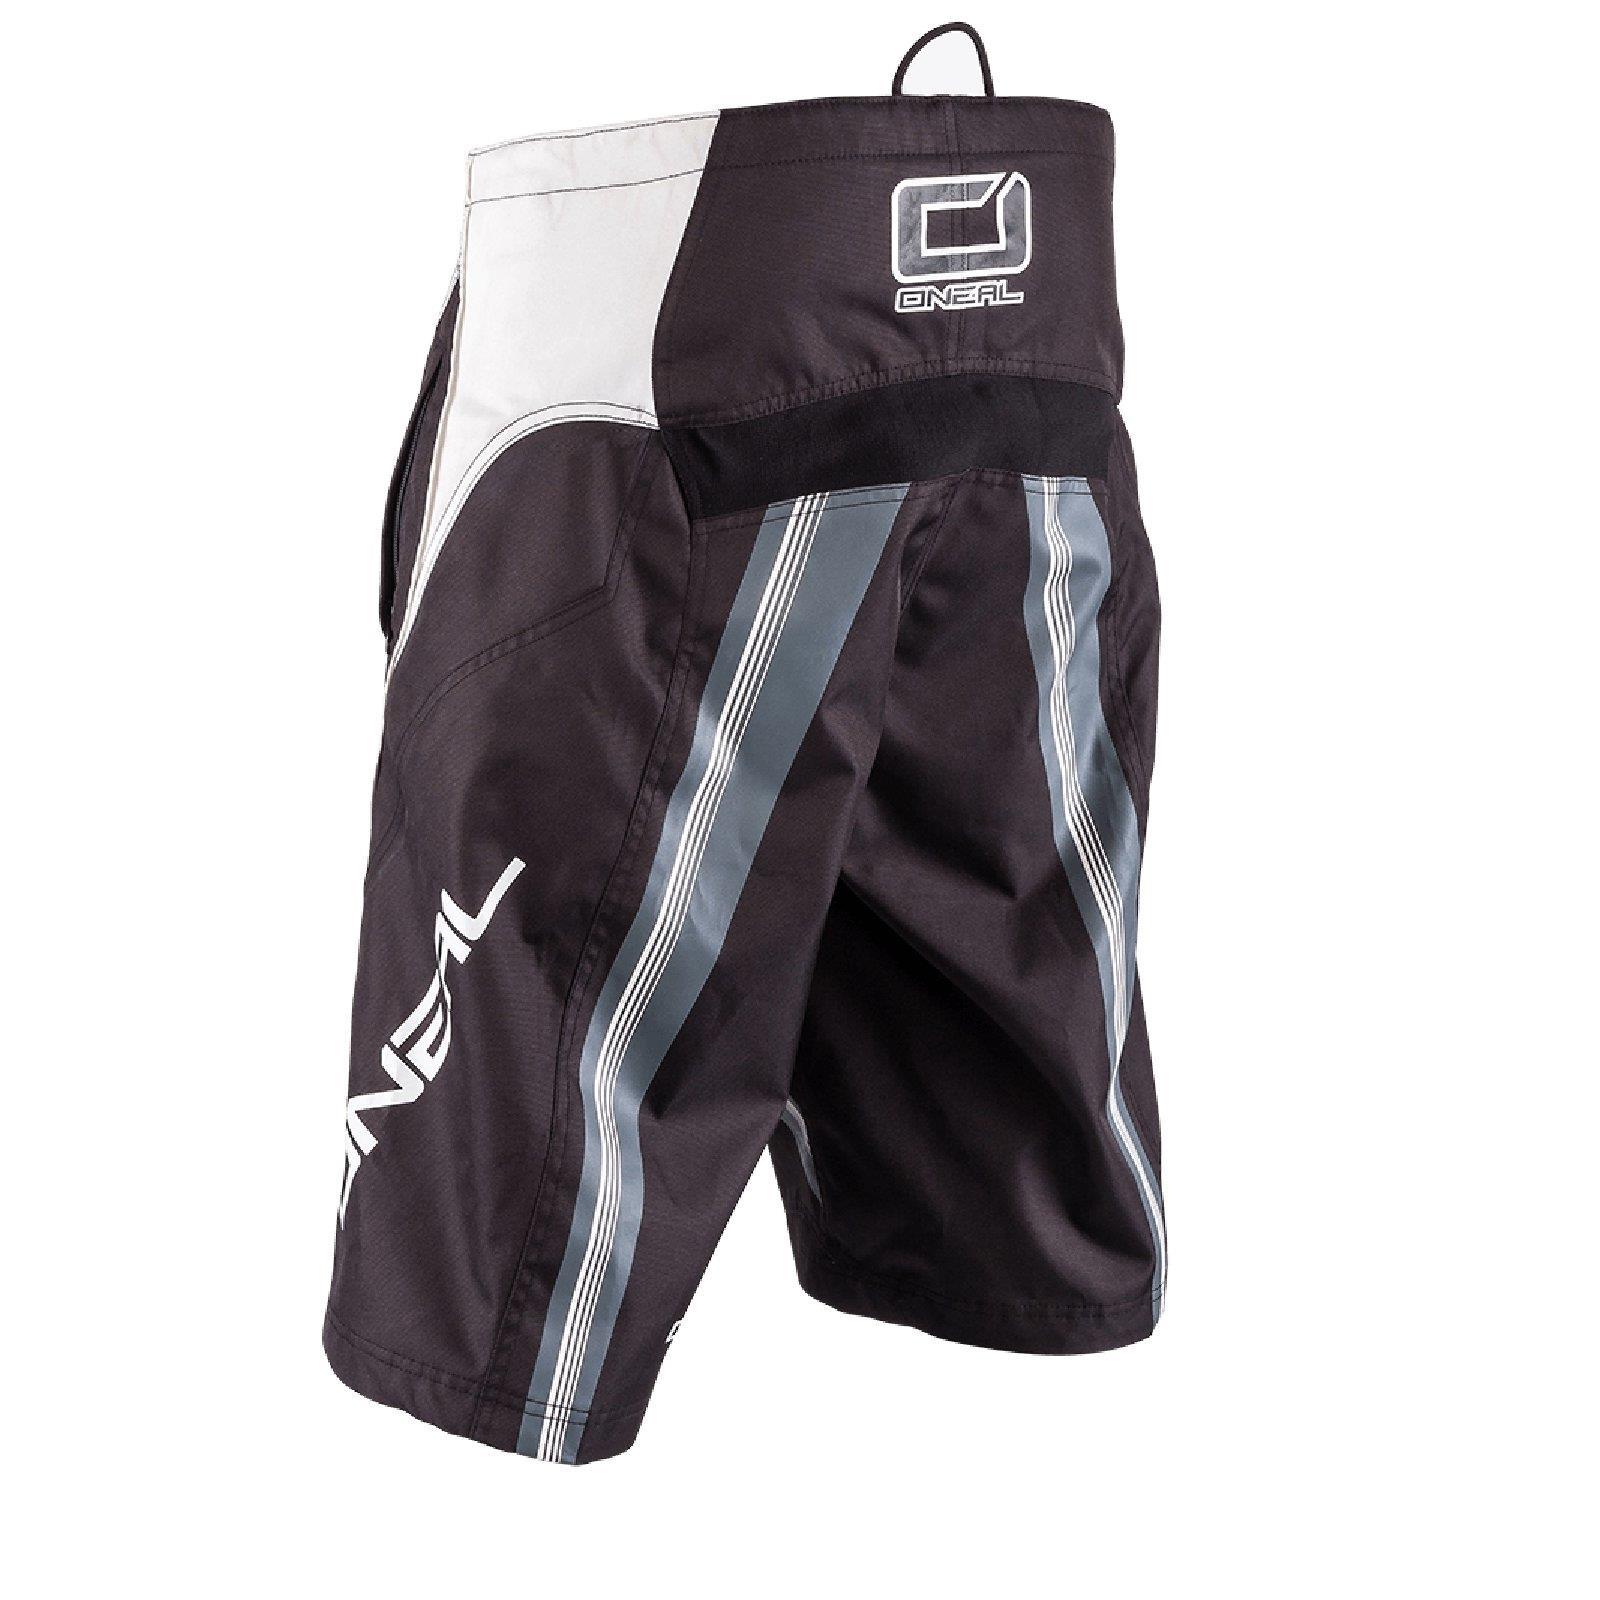 ONeal-pantalones-de-Jersey-de-los-ninos-de-pantalones-cortos-ninos-MX-bicicleta-DH-montana-bicicleta miniatura 40